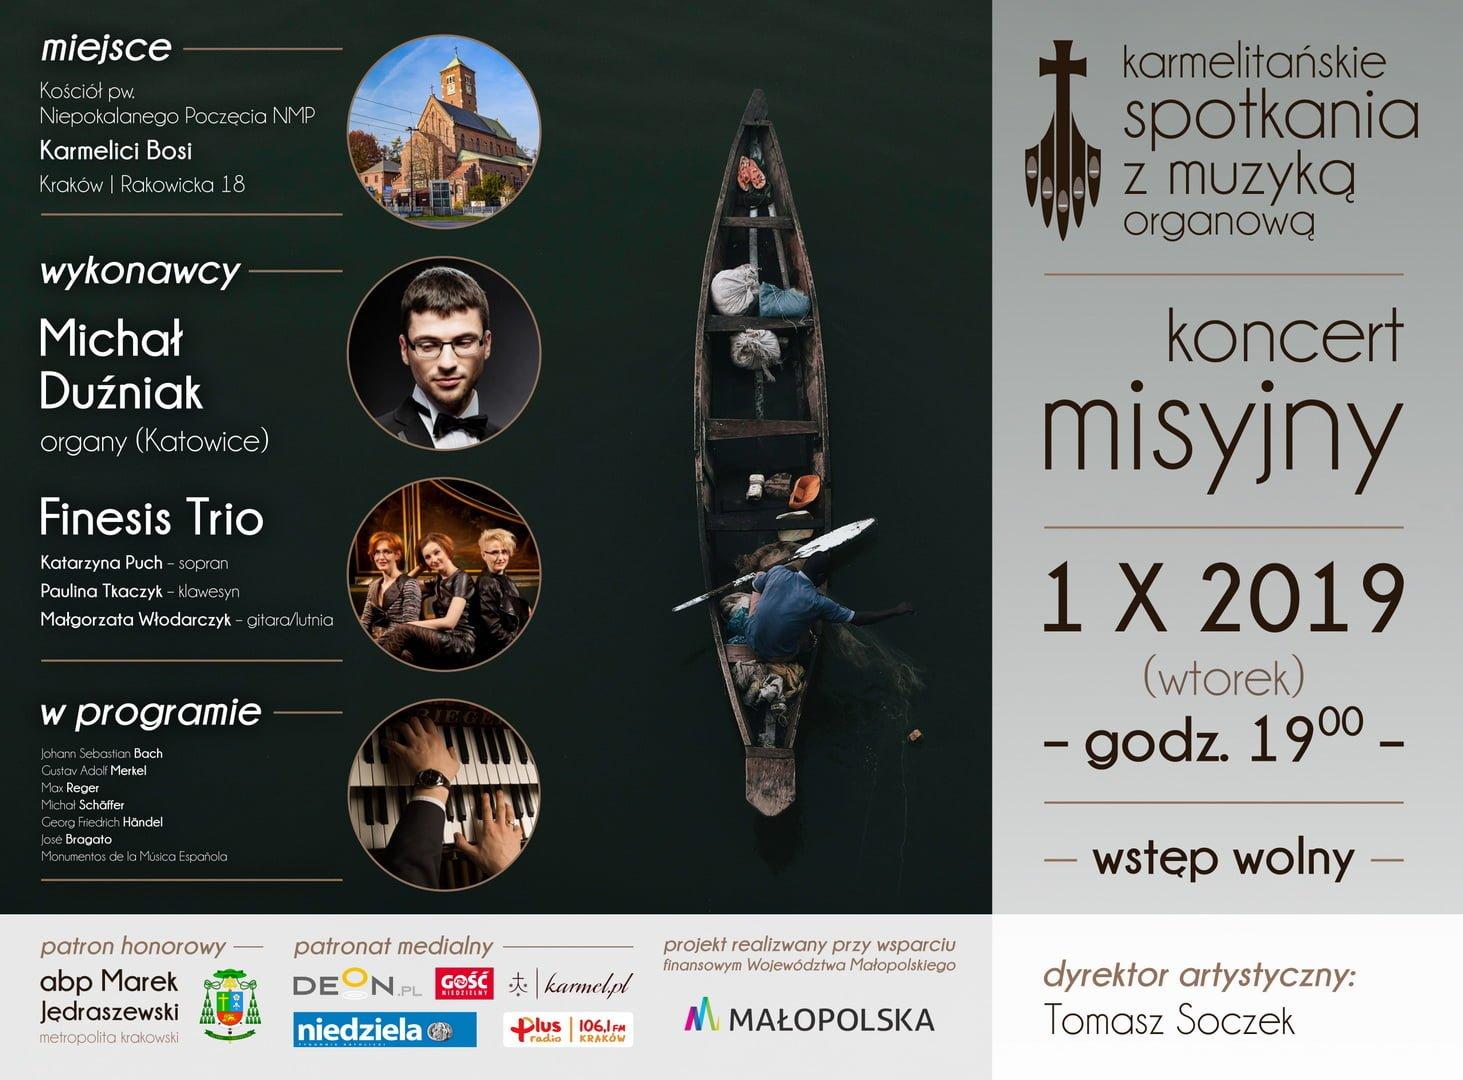 KSMO - koncert misyjny_banner